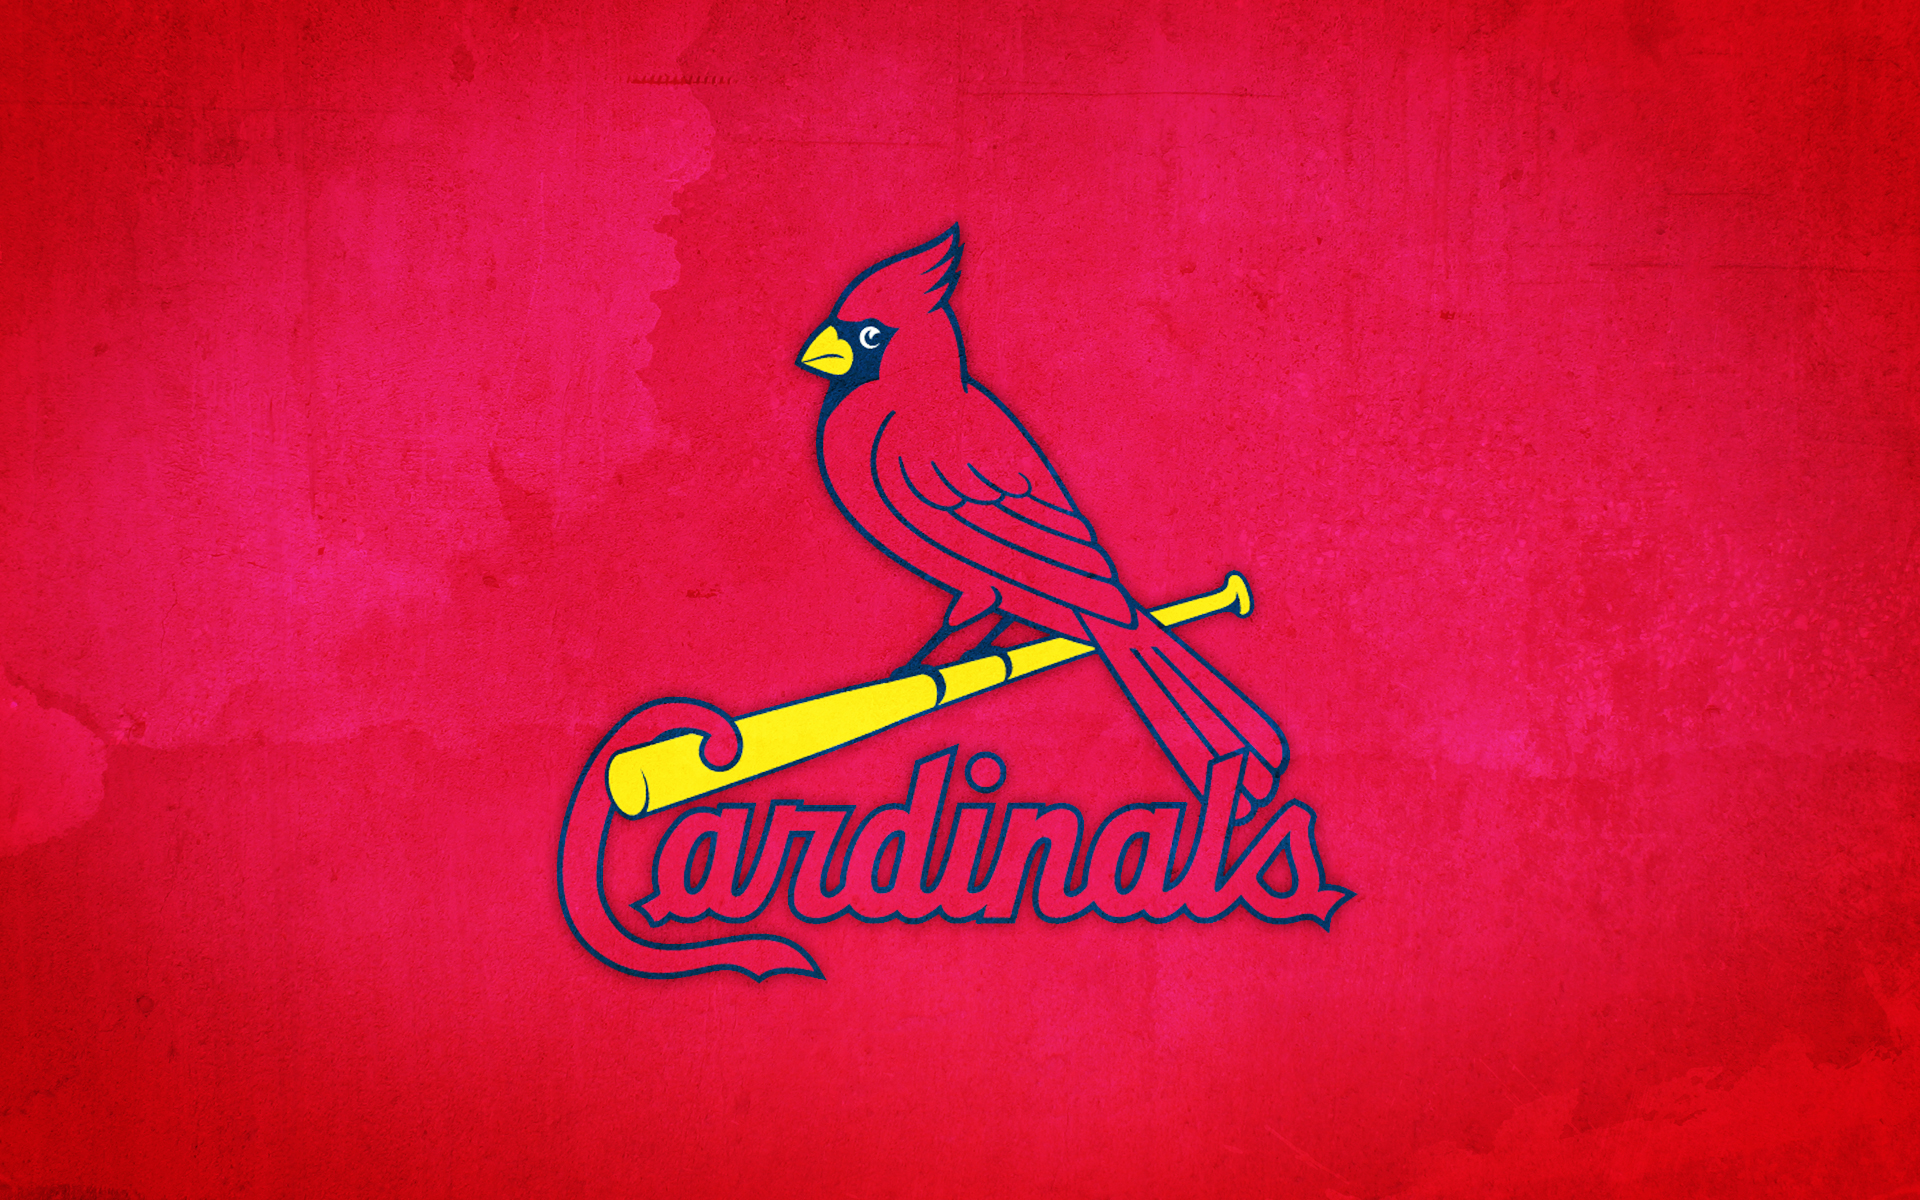 49 cardinals phone wallpaper on wallpapersafari - Free st louis cardinals desktop wallpaper ...